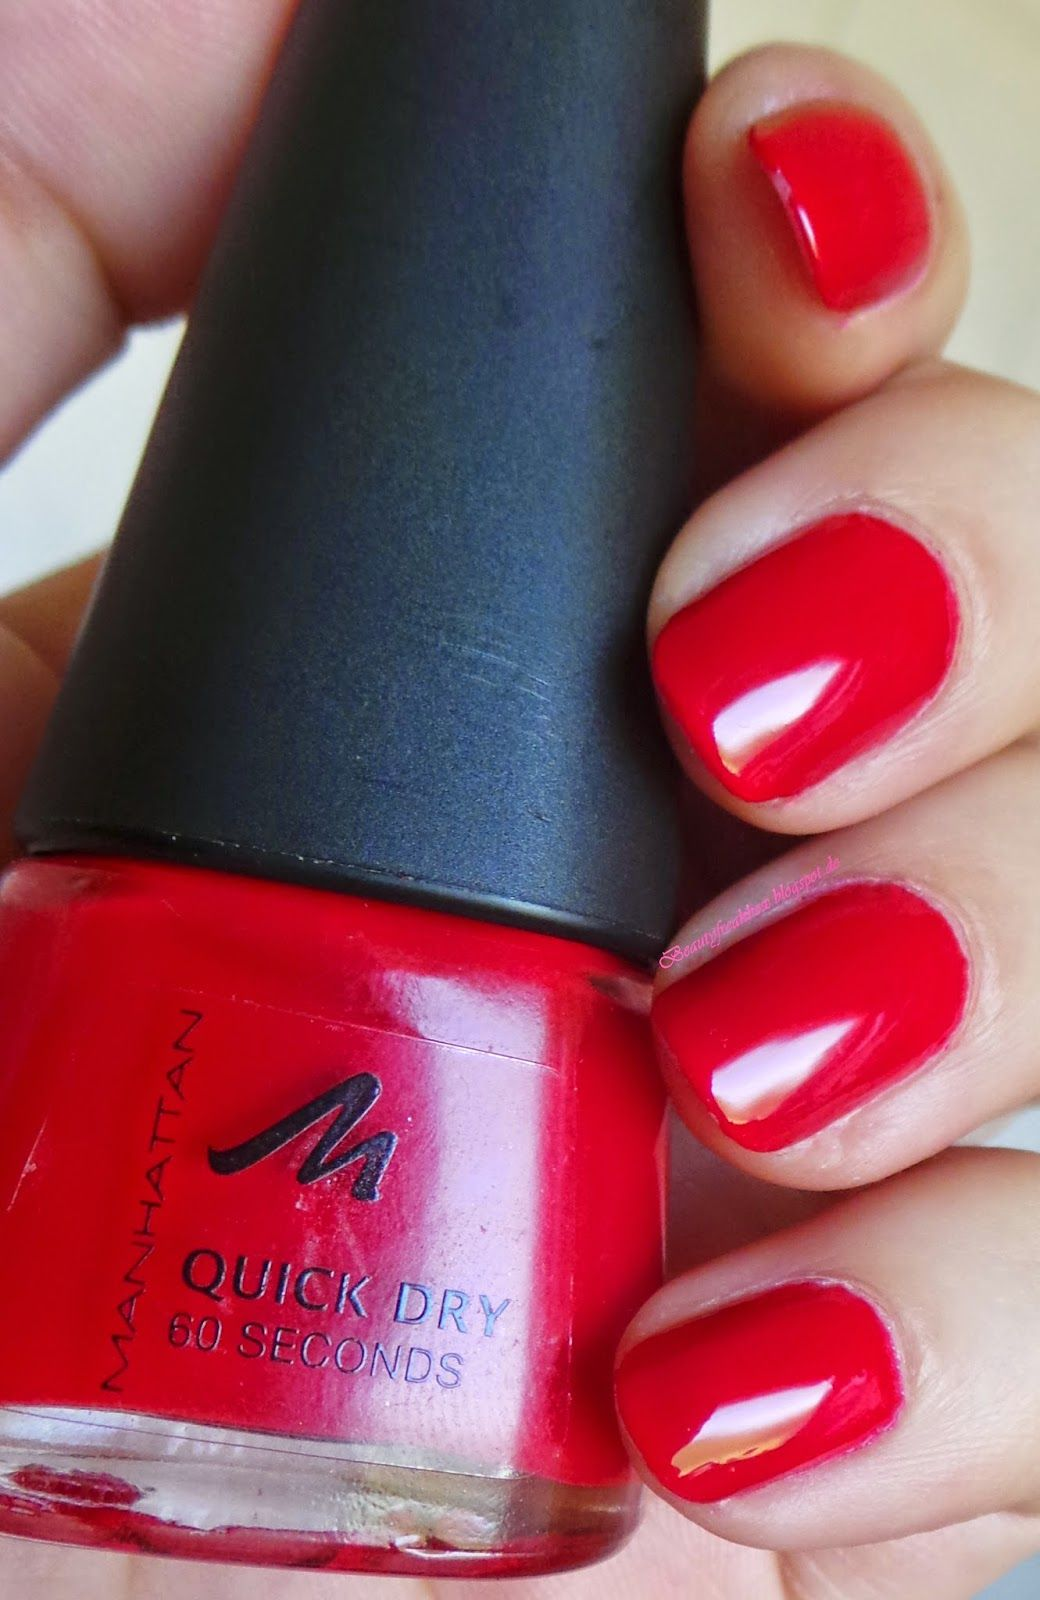 Beauty Freak Box: Manhattan Quick Dry 60 Seconds Nail Polish - 44s ...